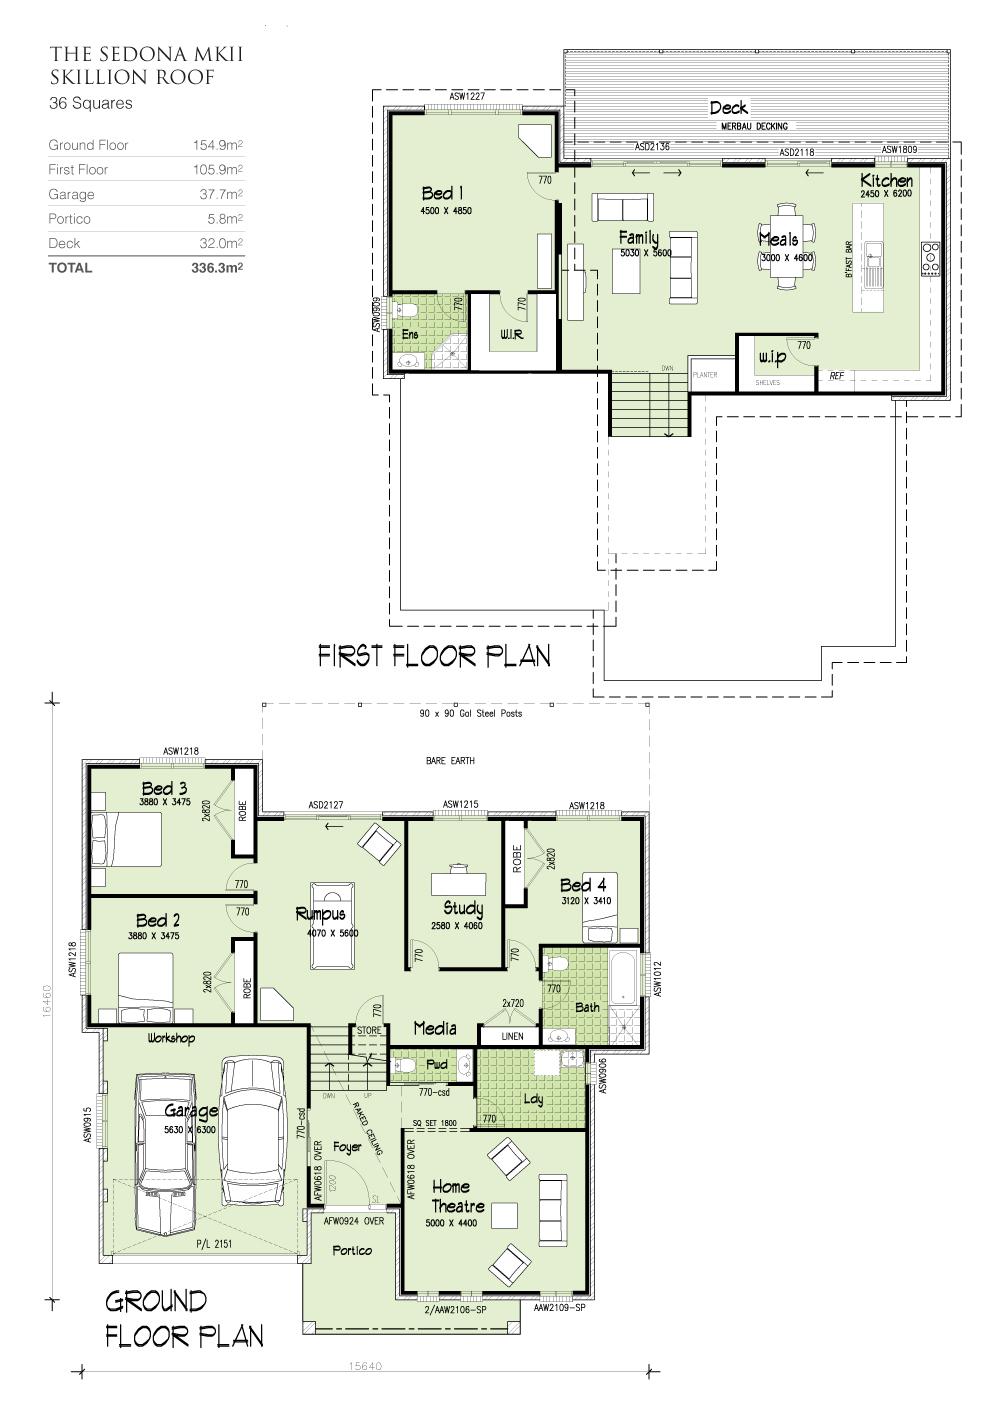 Sedona MKII - TRI-LEVEL - Skillion Roof., Home Design, Tullipan Homes